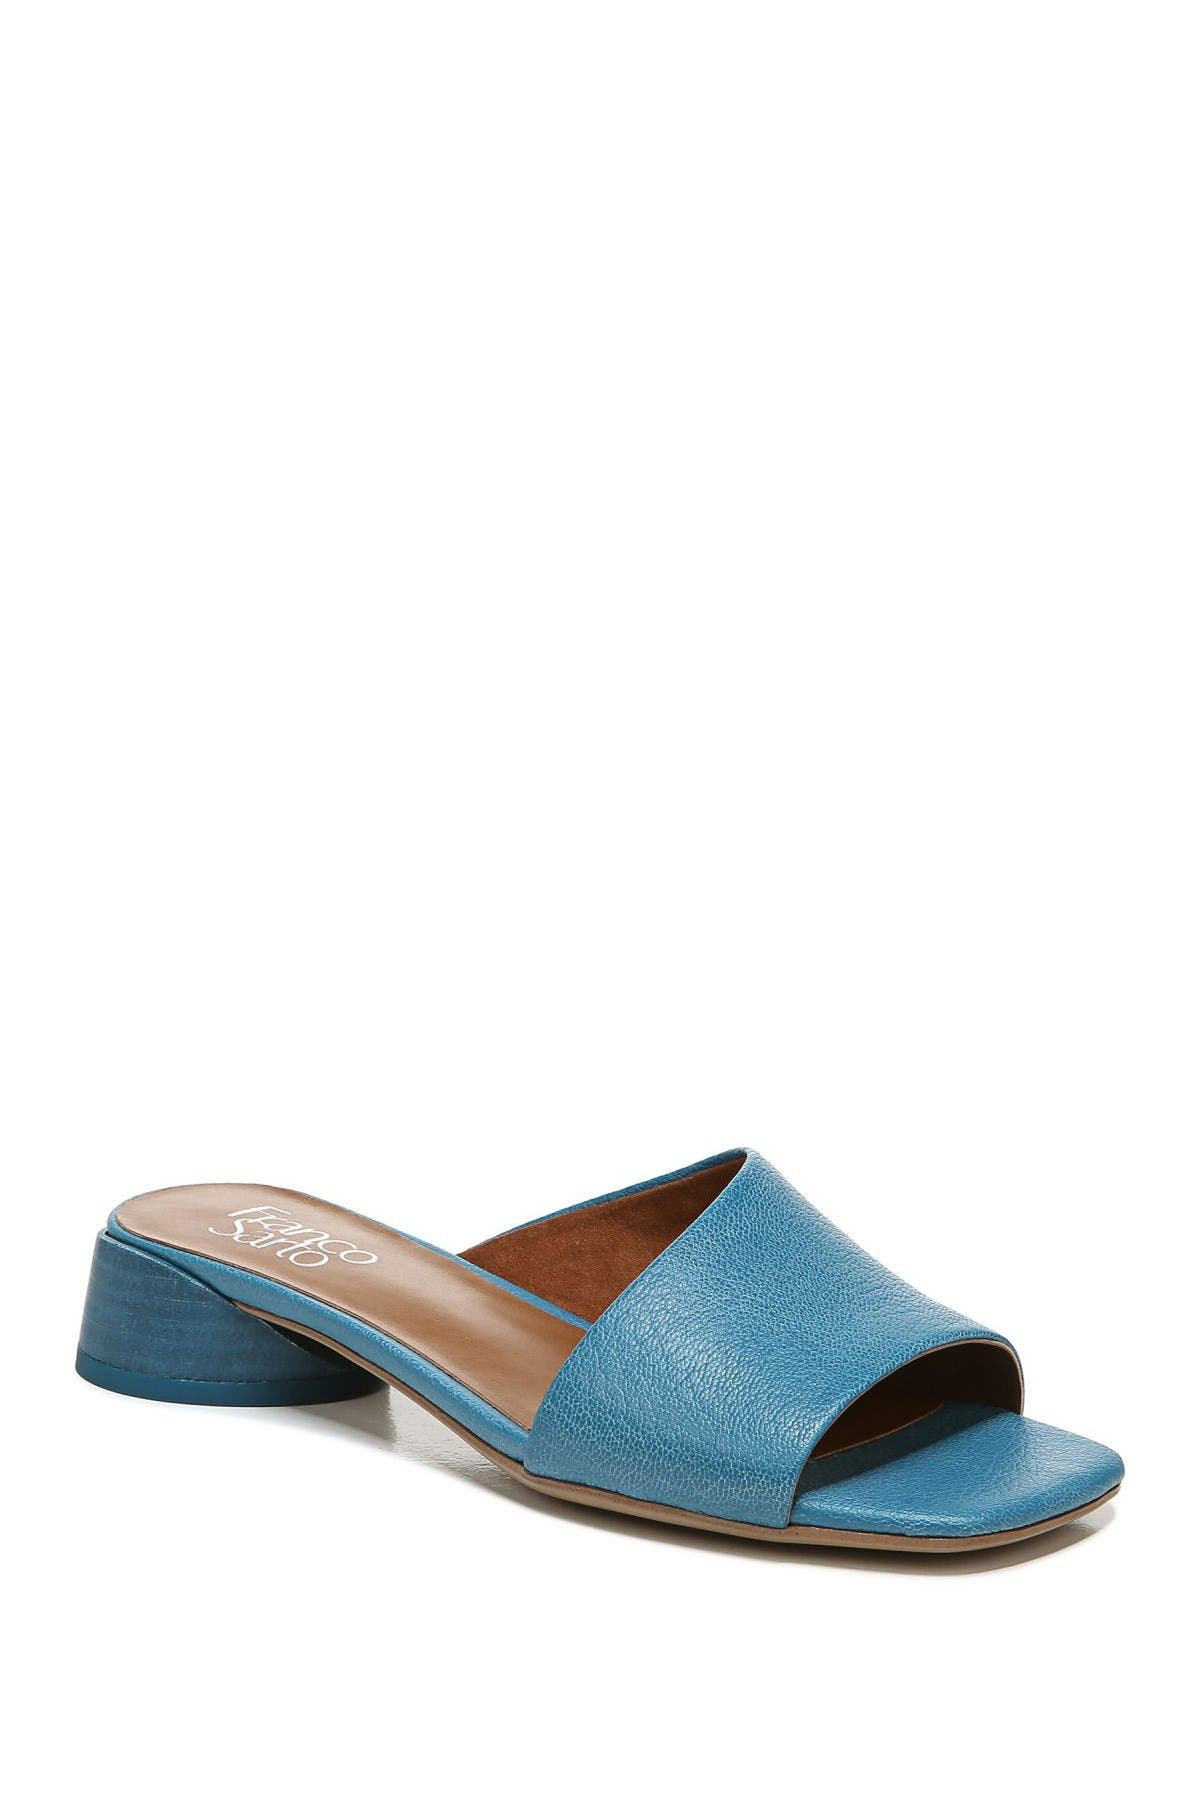 Image of Franco Sarto Leslie Leather Block Heel Sandal